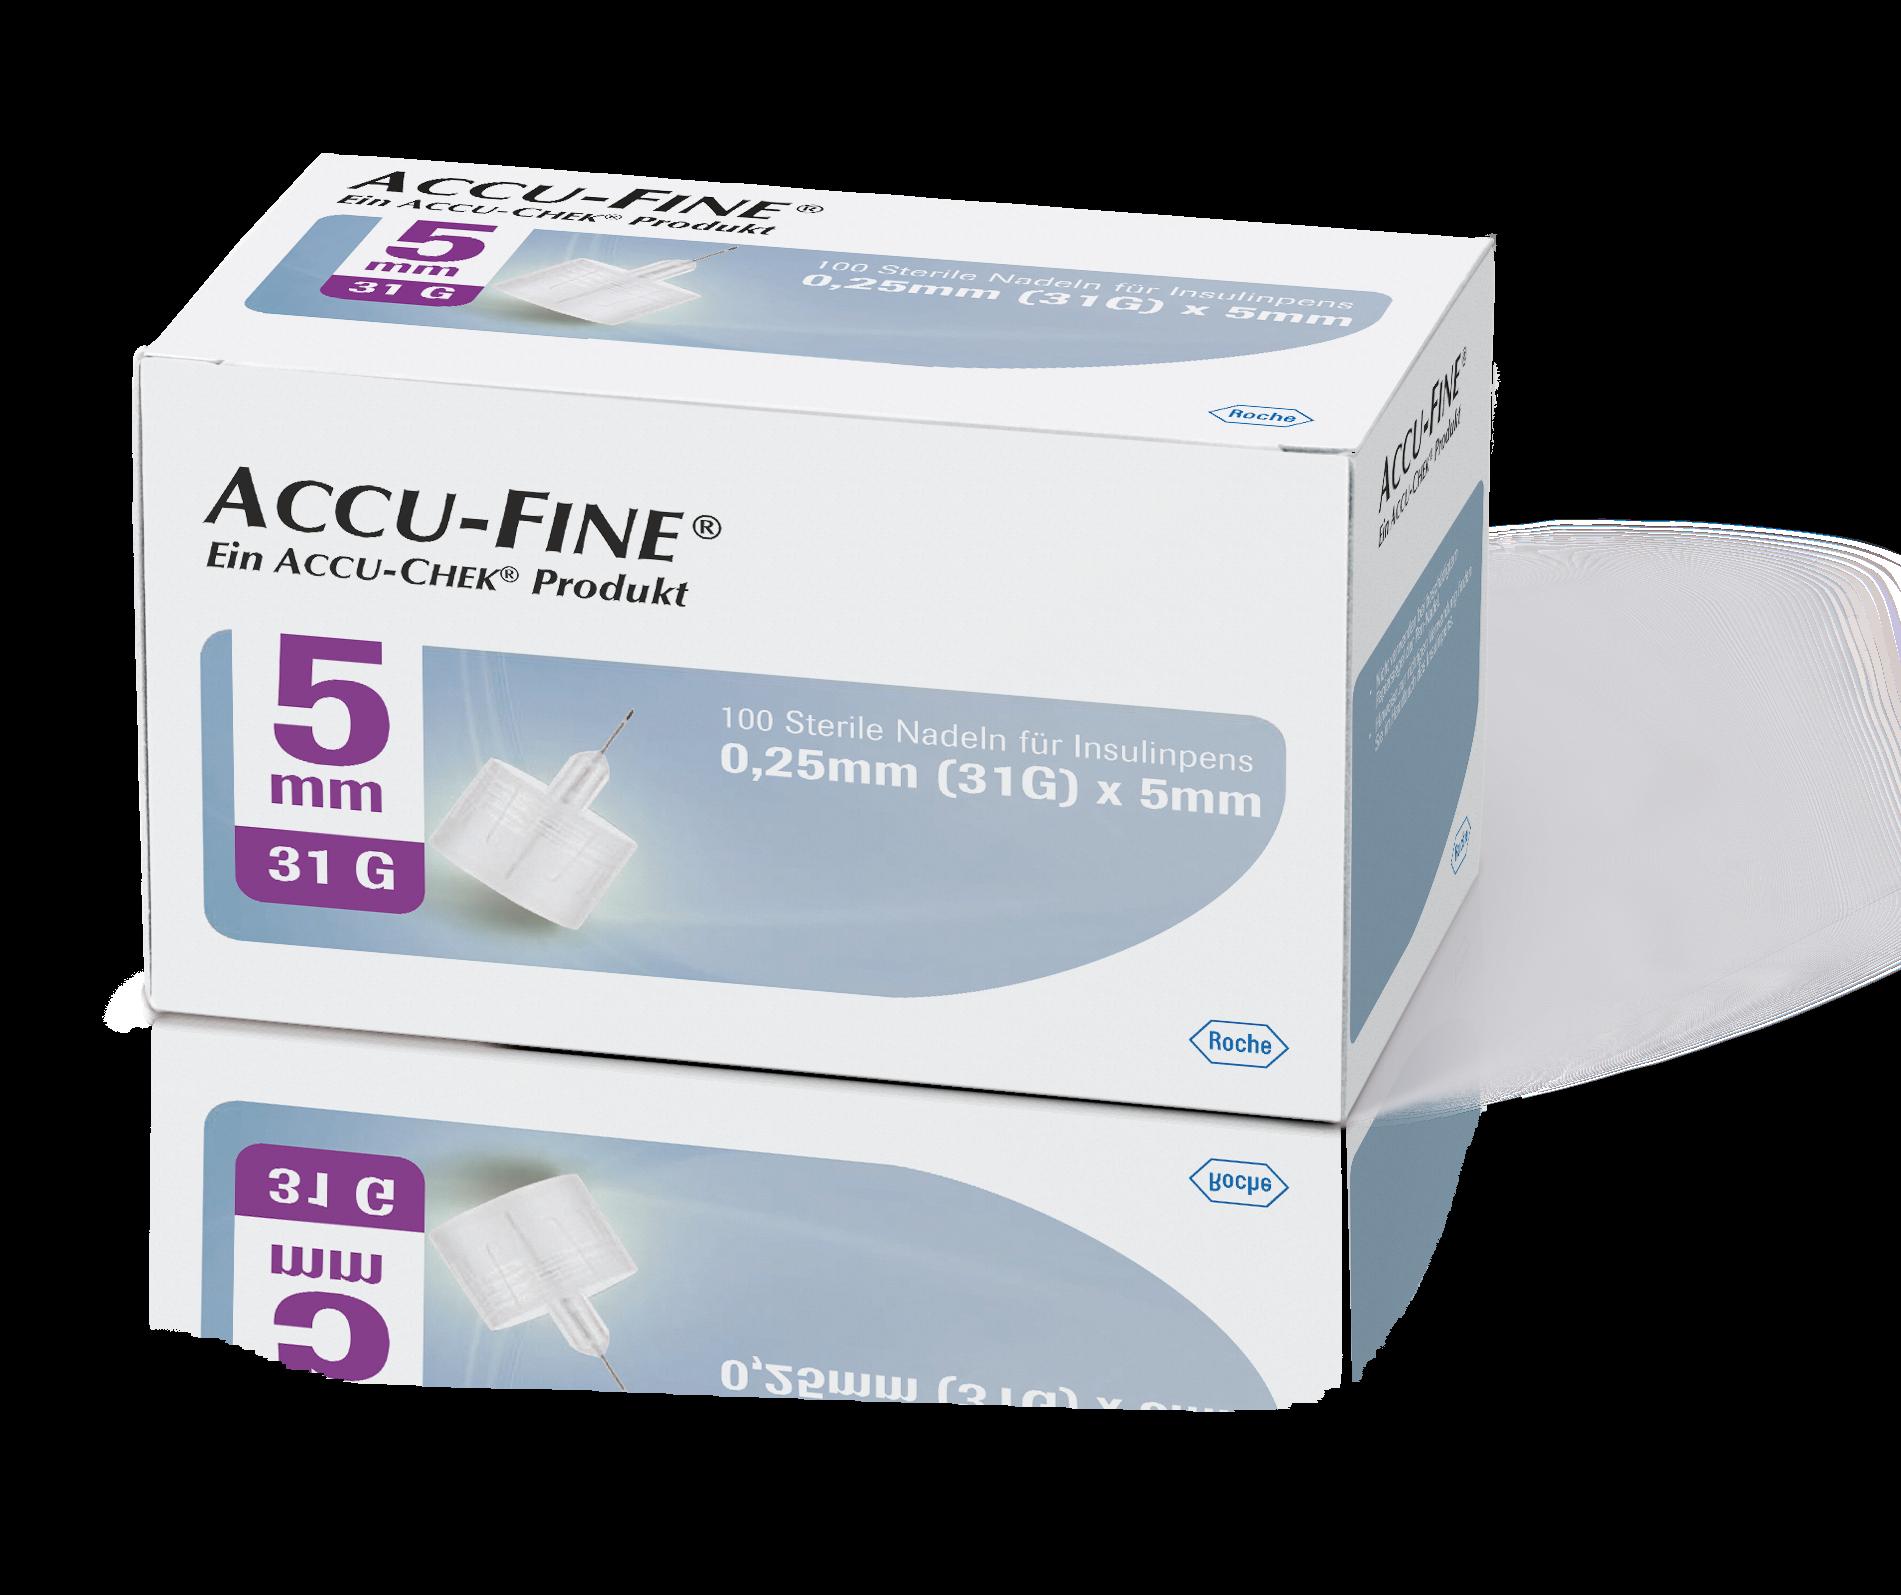 Accu-Fine Pen-Nadeln 31G 5mm 100 Stück